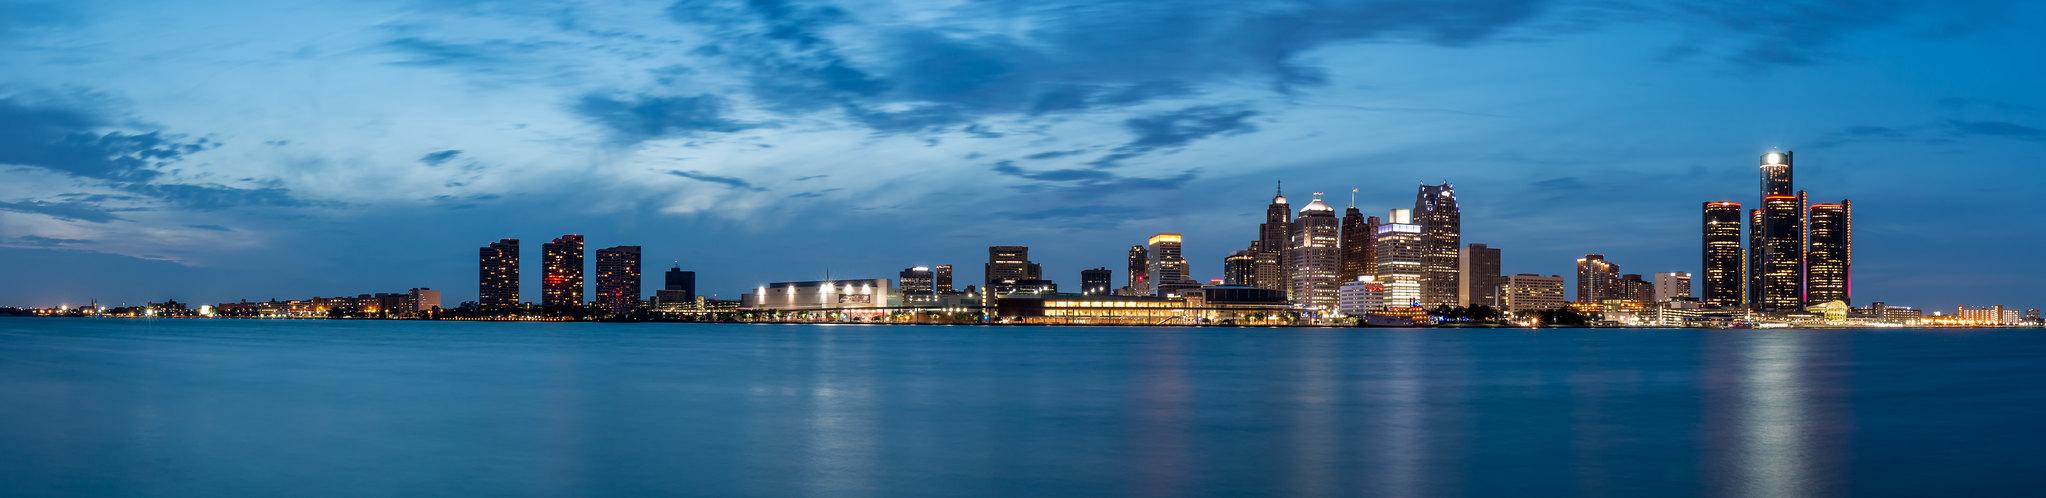 Détroit - Michigan - [USA]